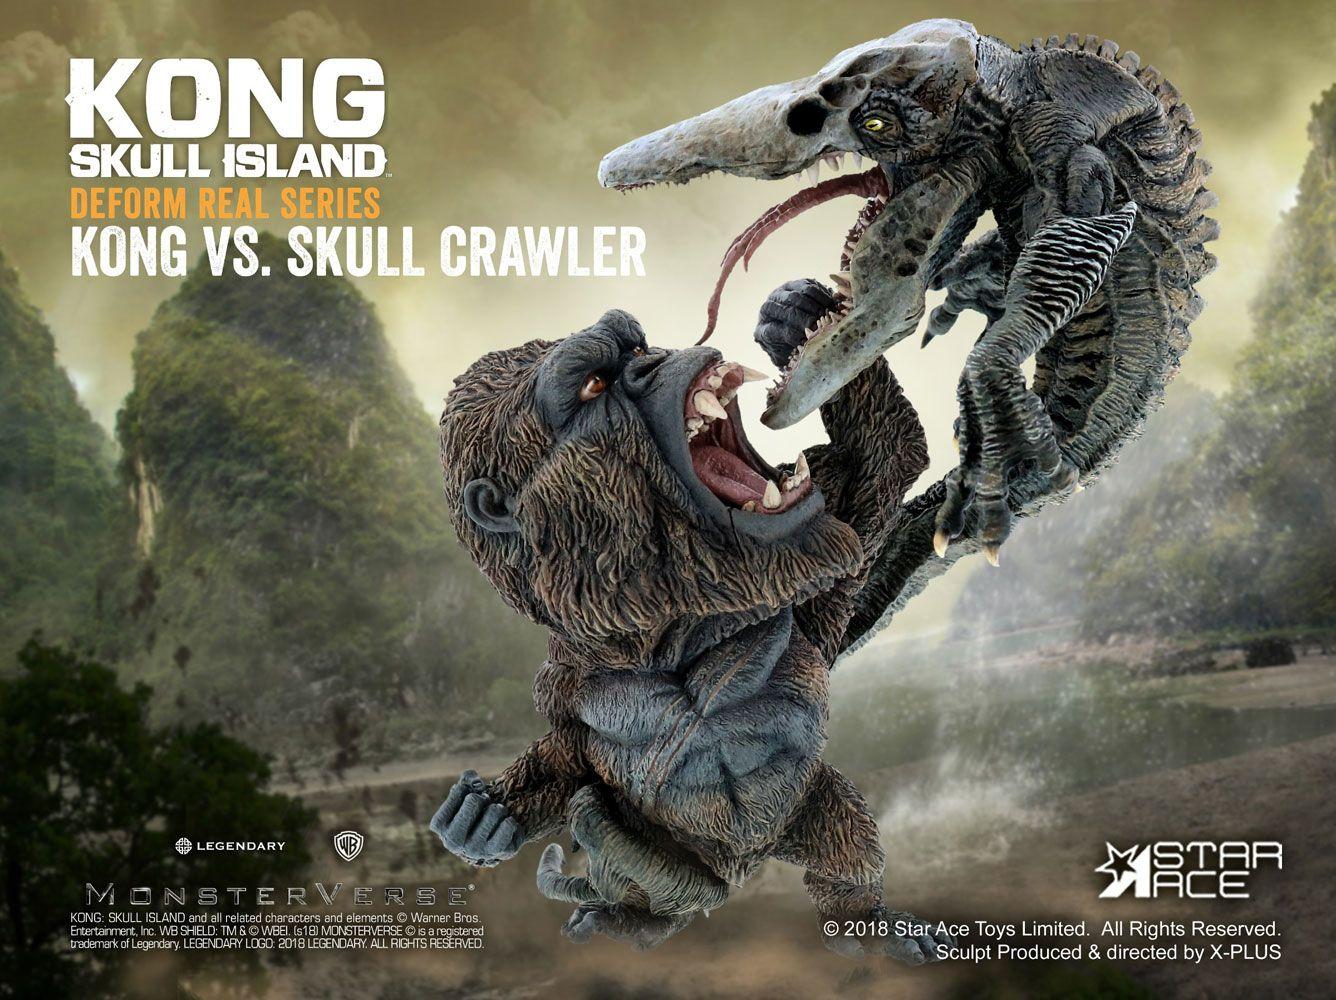 Kong Skull Island Deform Real Series Soft Statue Kong vs Crawler 23 cm